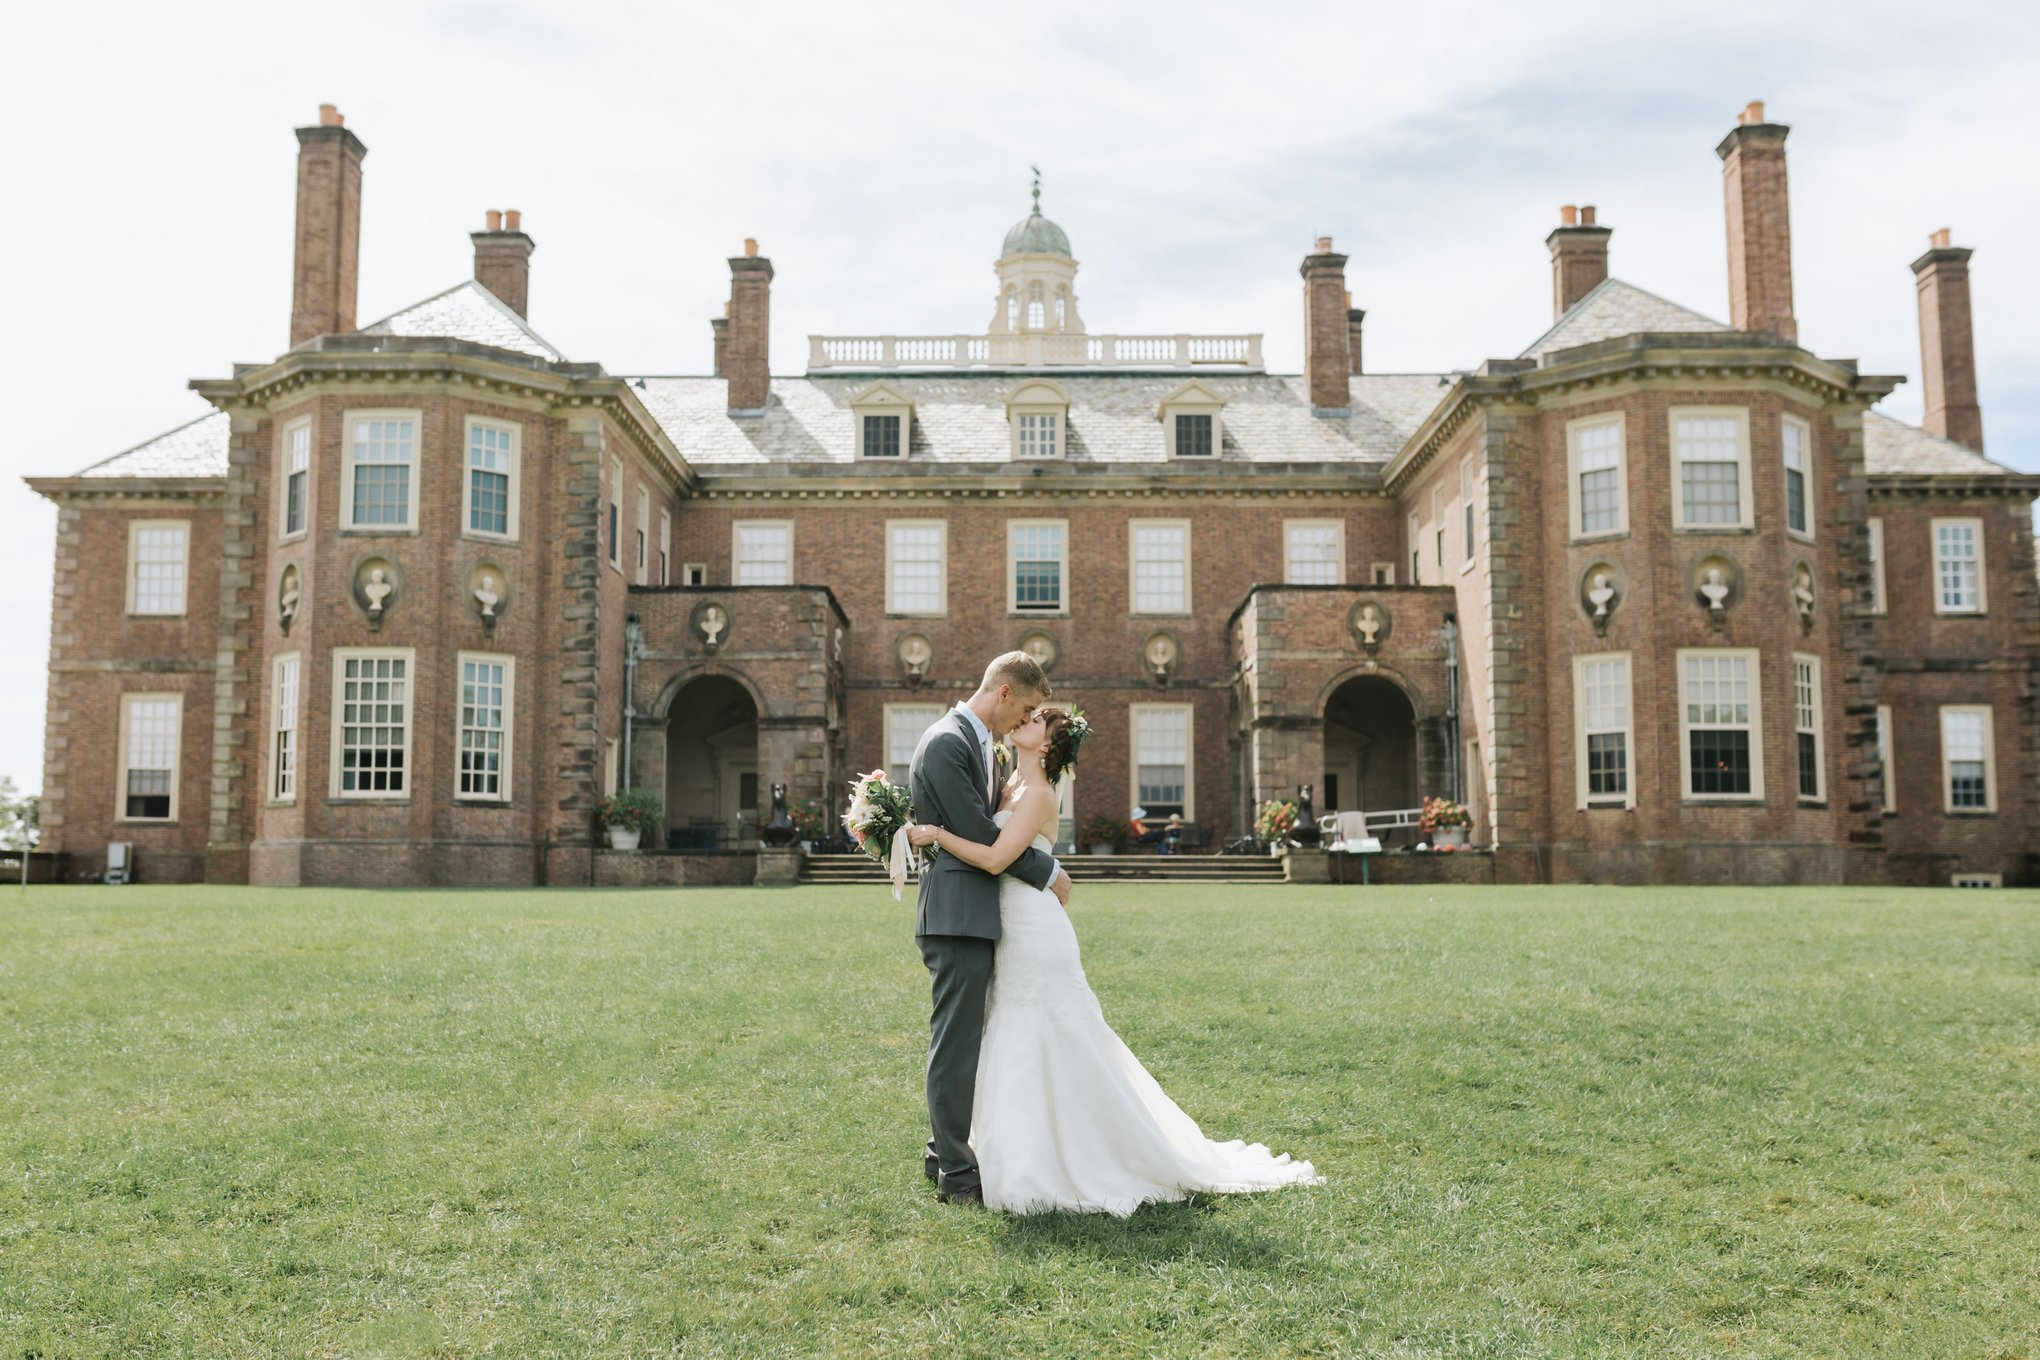 Crane-Estate-Vow-Renewal-Wedding-16.JPG